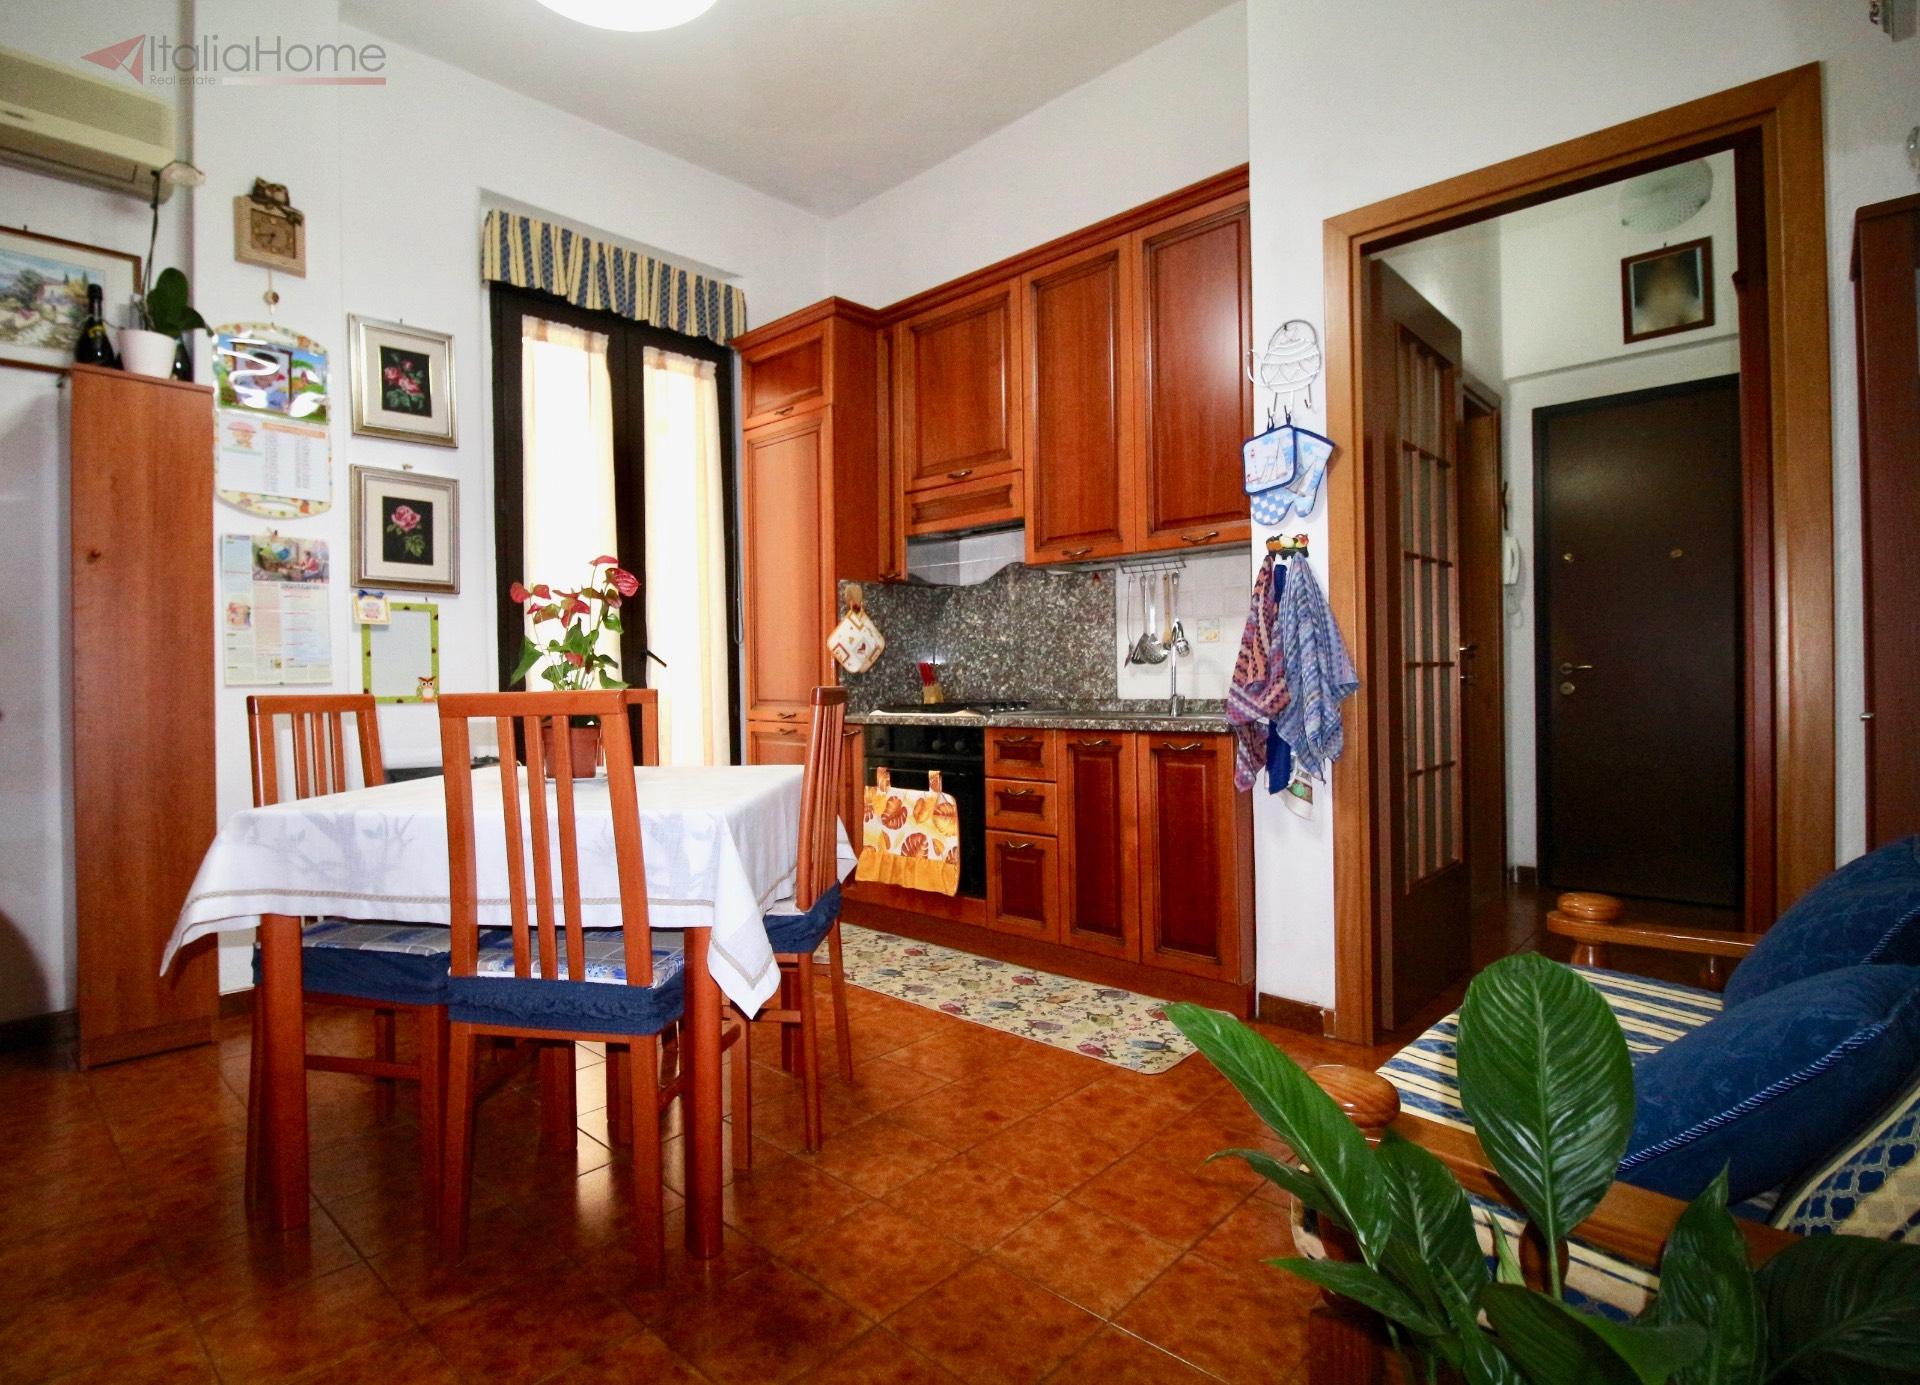 cagliari vendita quart: monte urpinu italia-home-s.r.l.